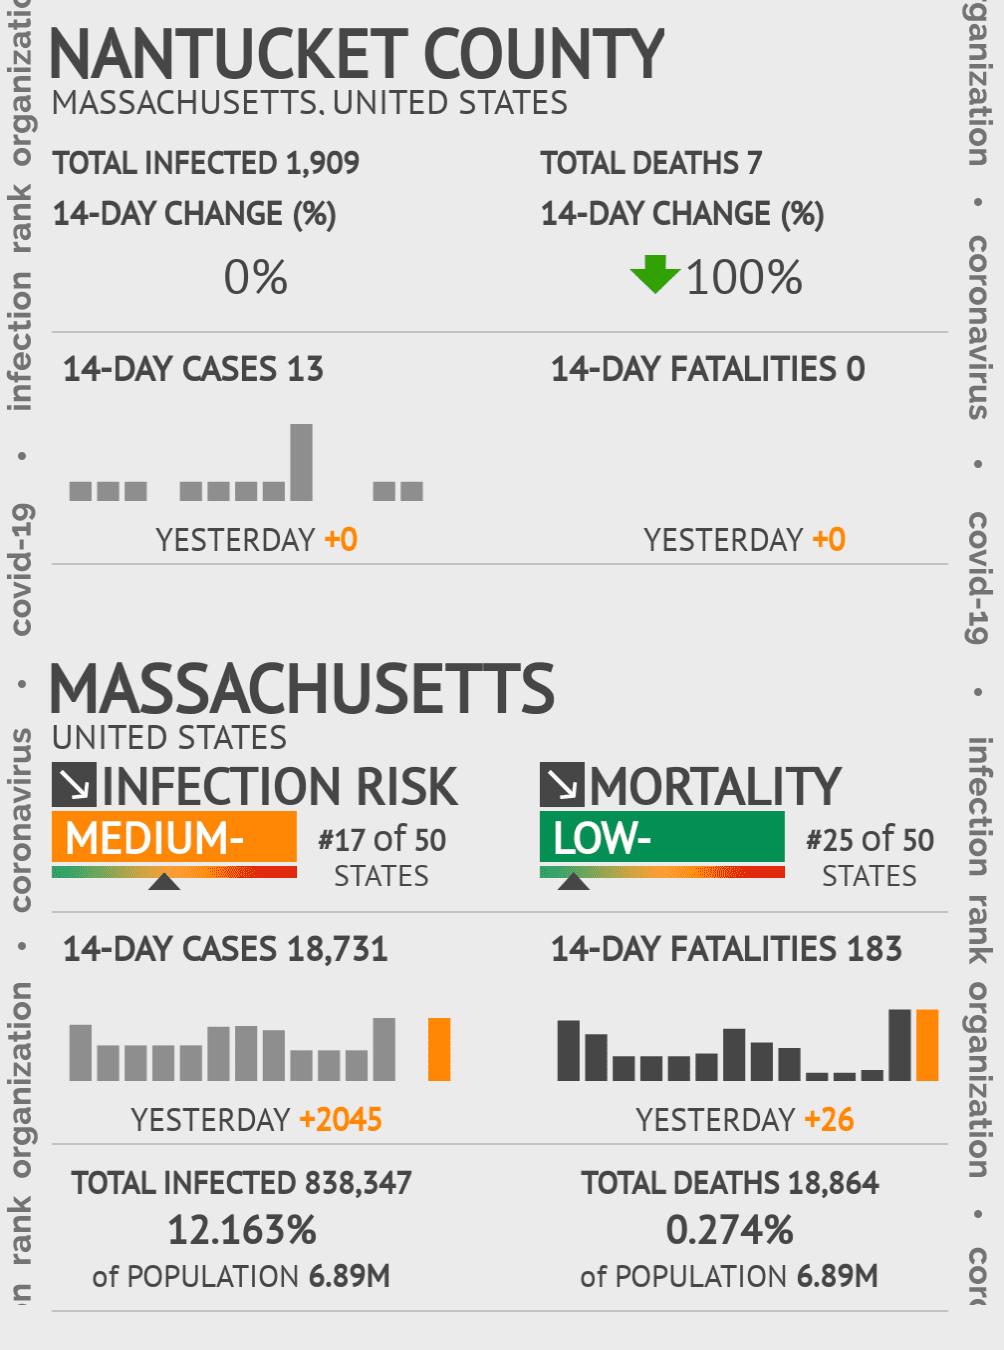 Nantucket County Coronavirus Covid-19 Risk of Infection on October 22, 2020